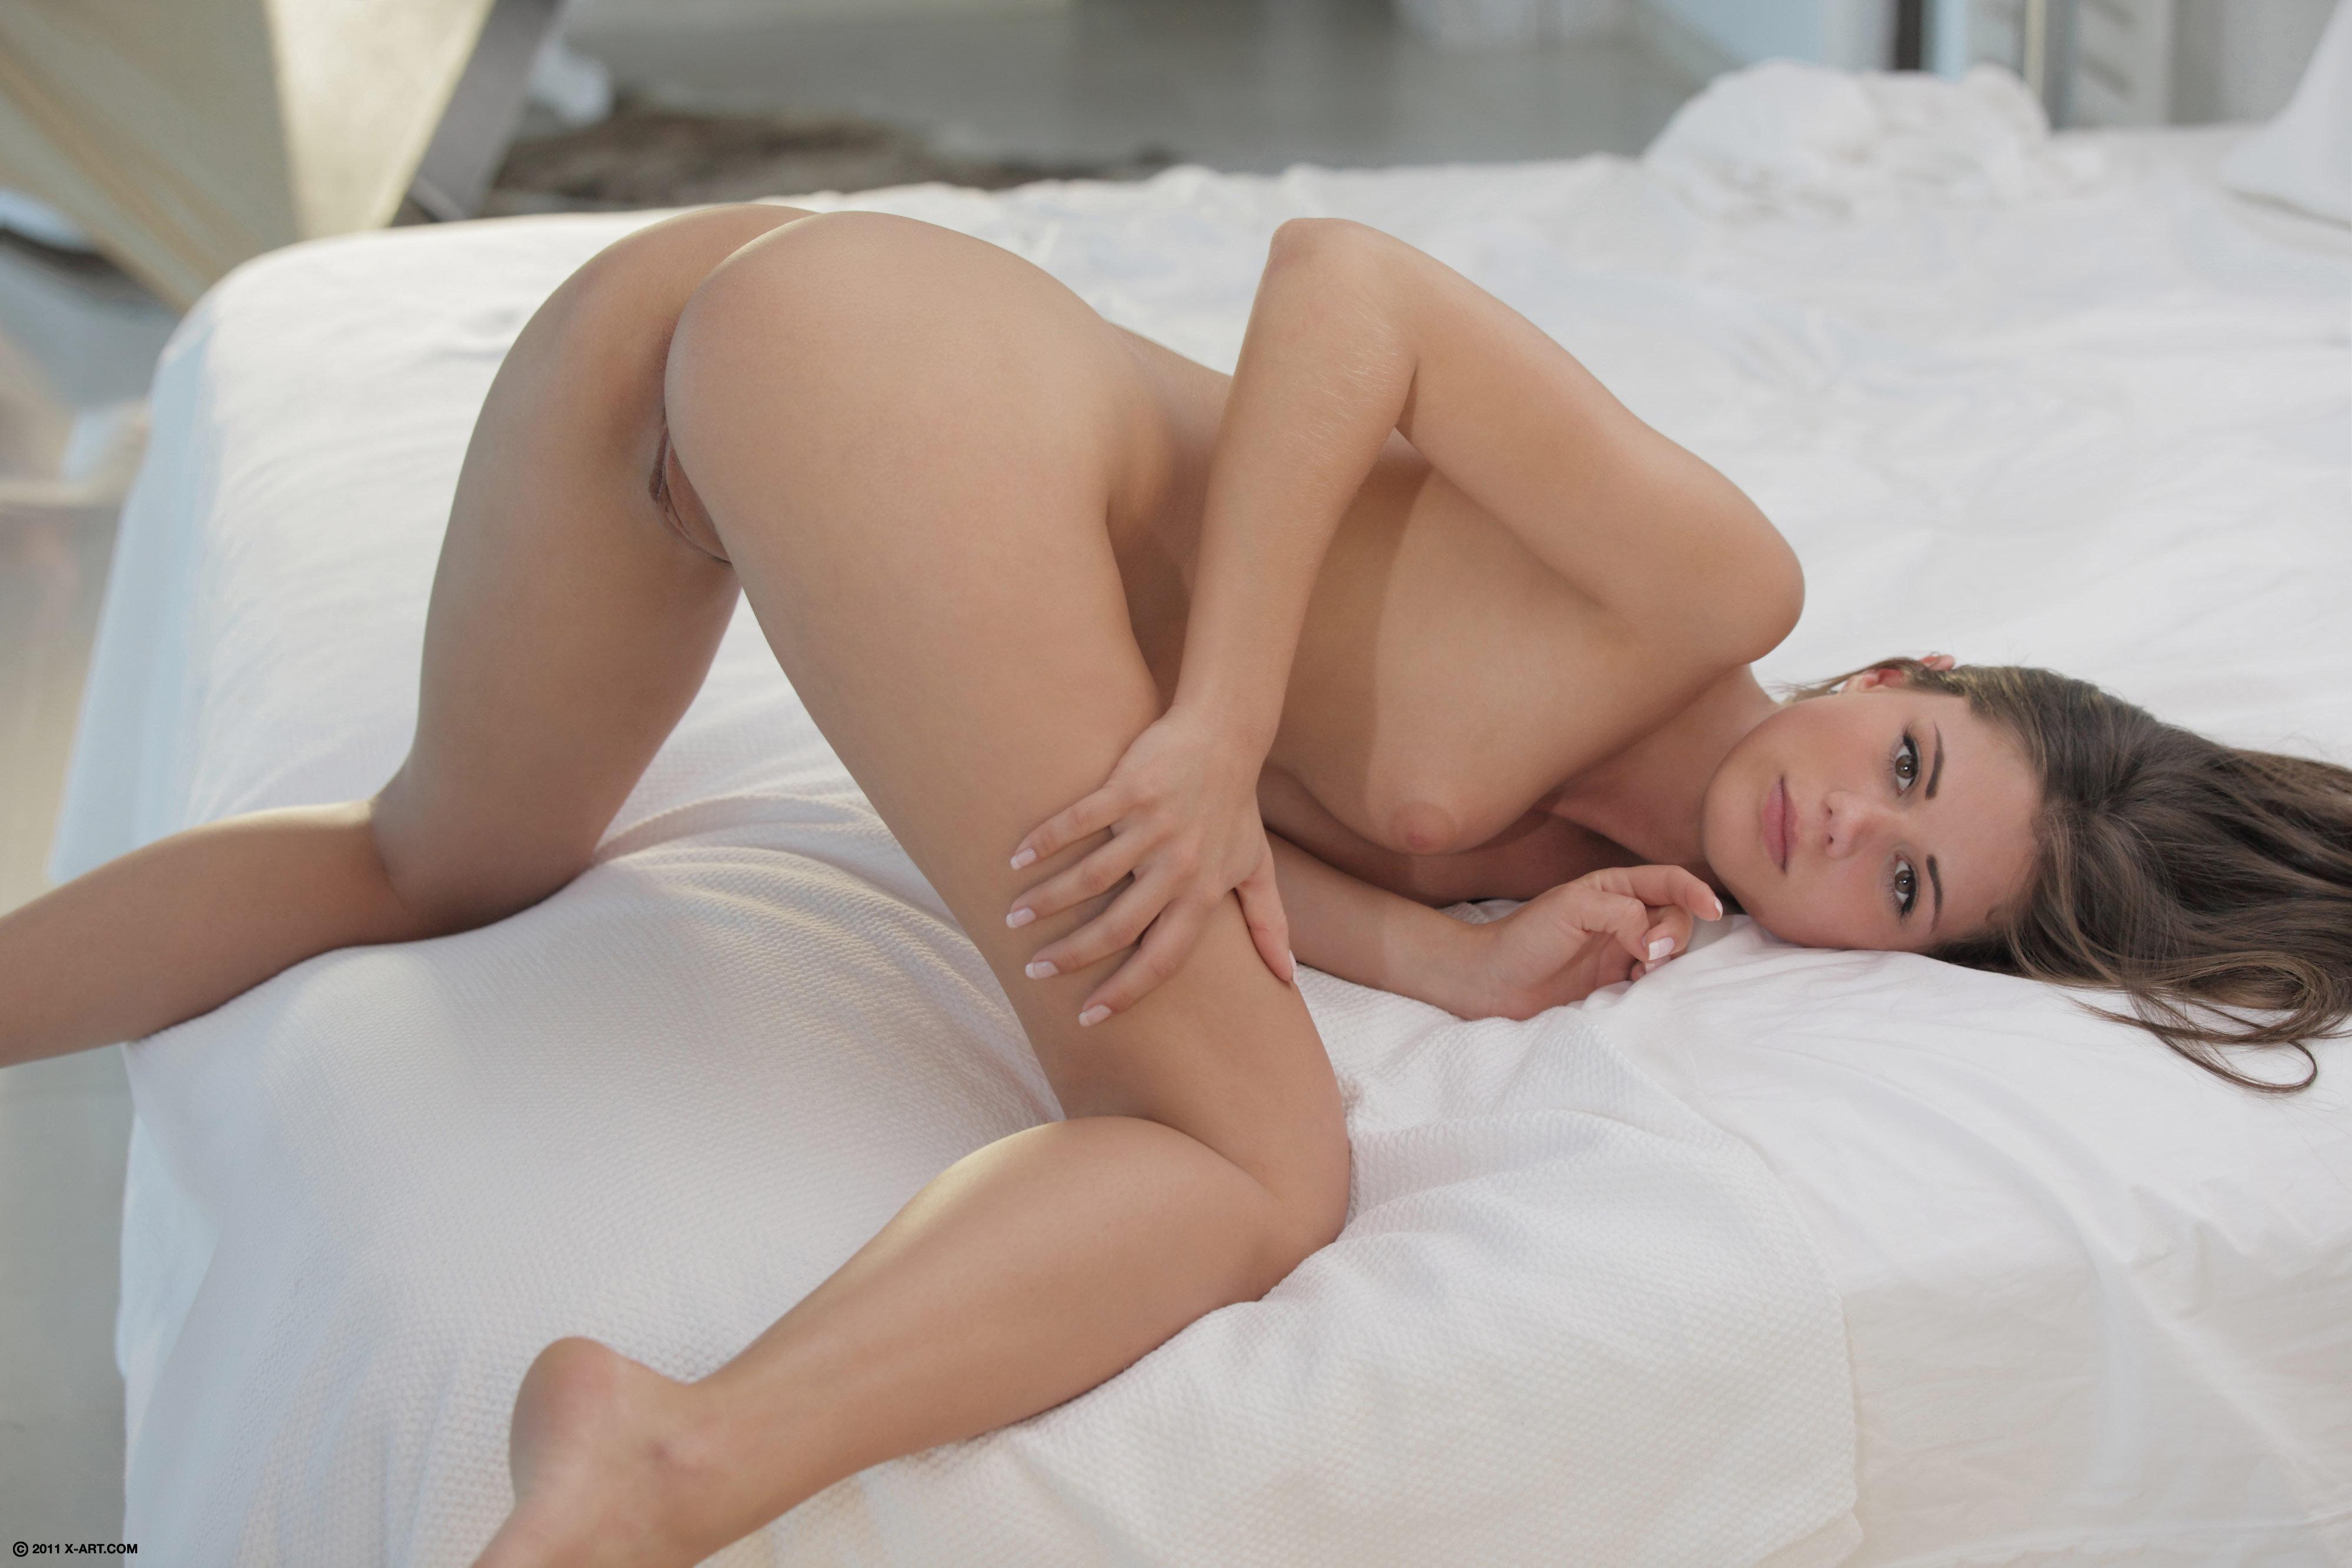 Xart Girl Porn Videos  Erotic Videos HD  VK